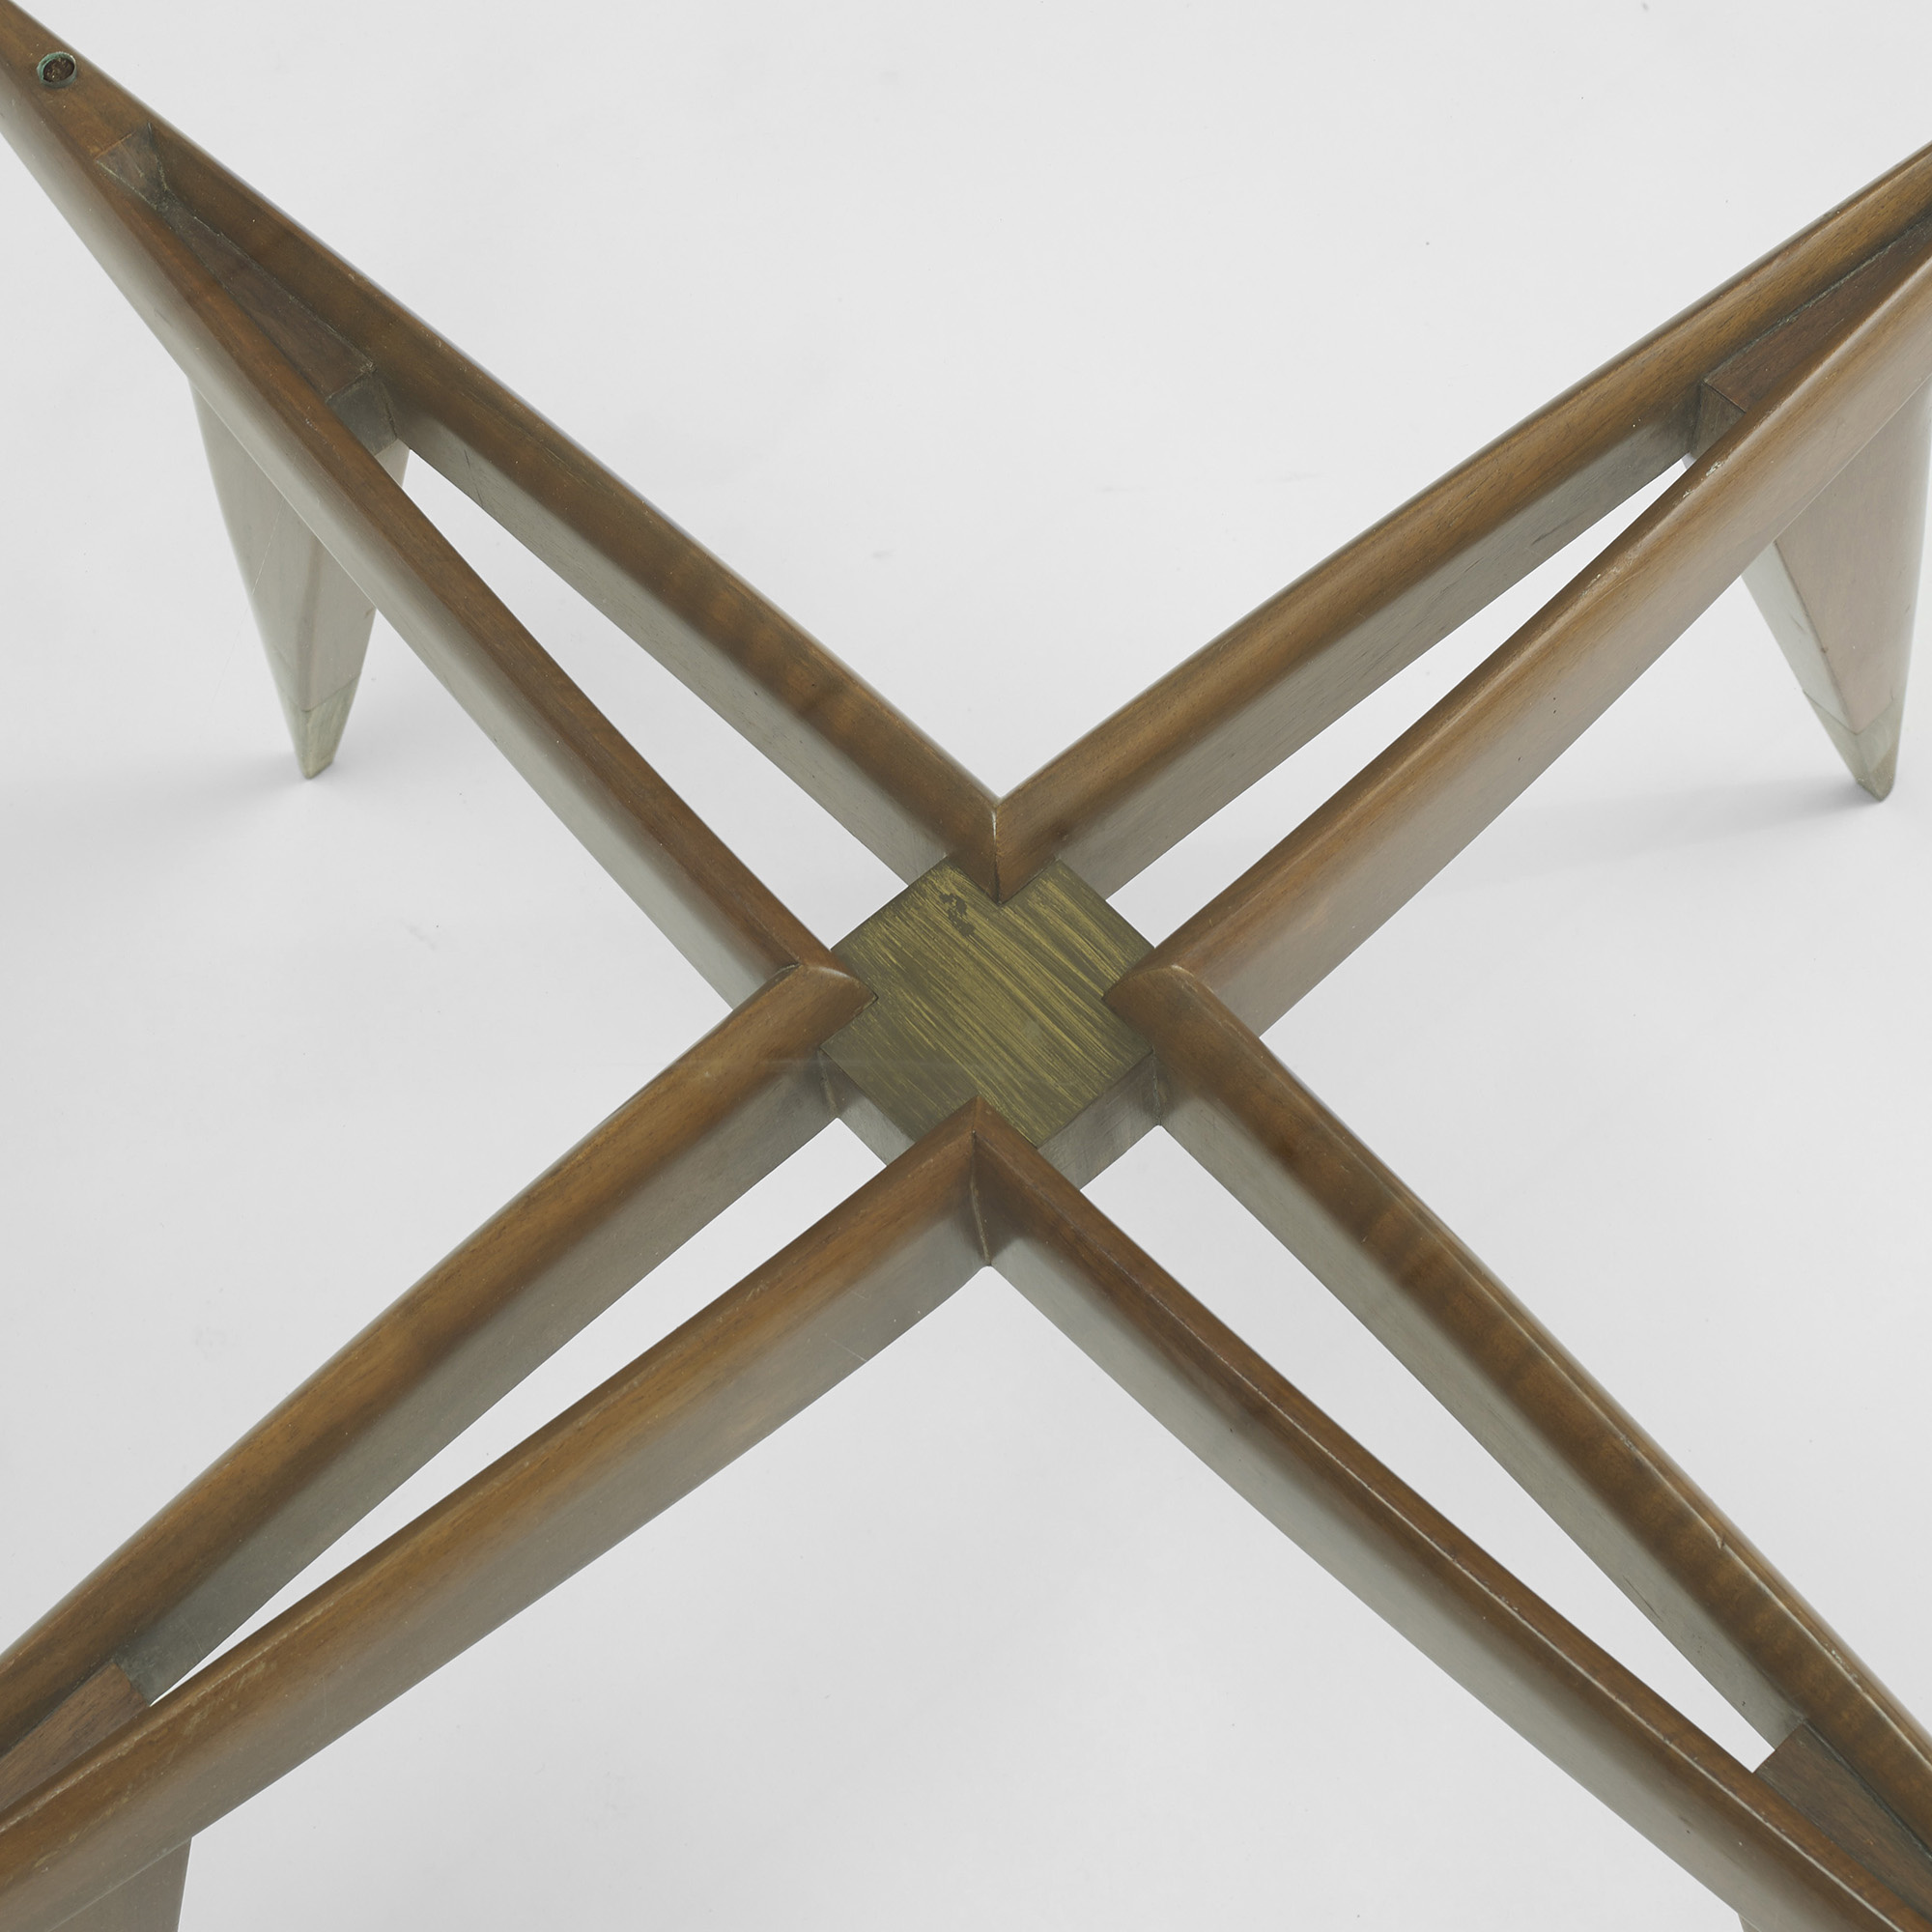 216 Gio Ponti coffee table Design 12 June 2014 Auctions